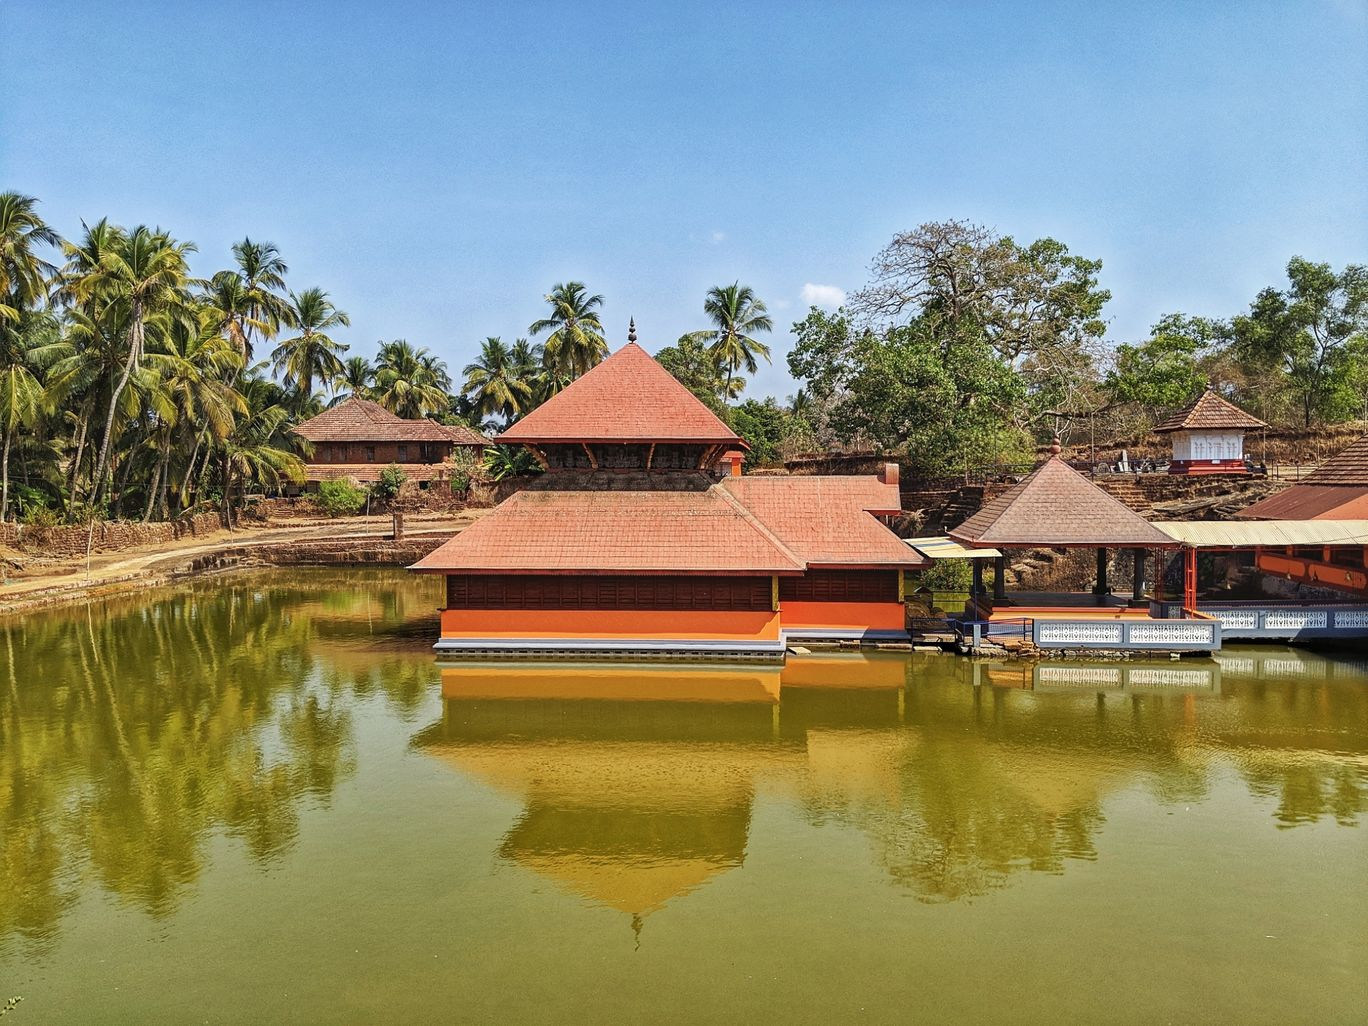 Photo of Ananthapura Lake Temple By Viola Lewis